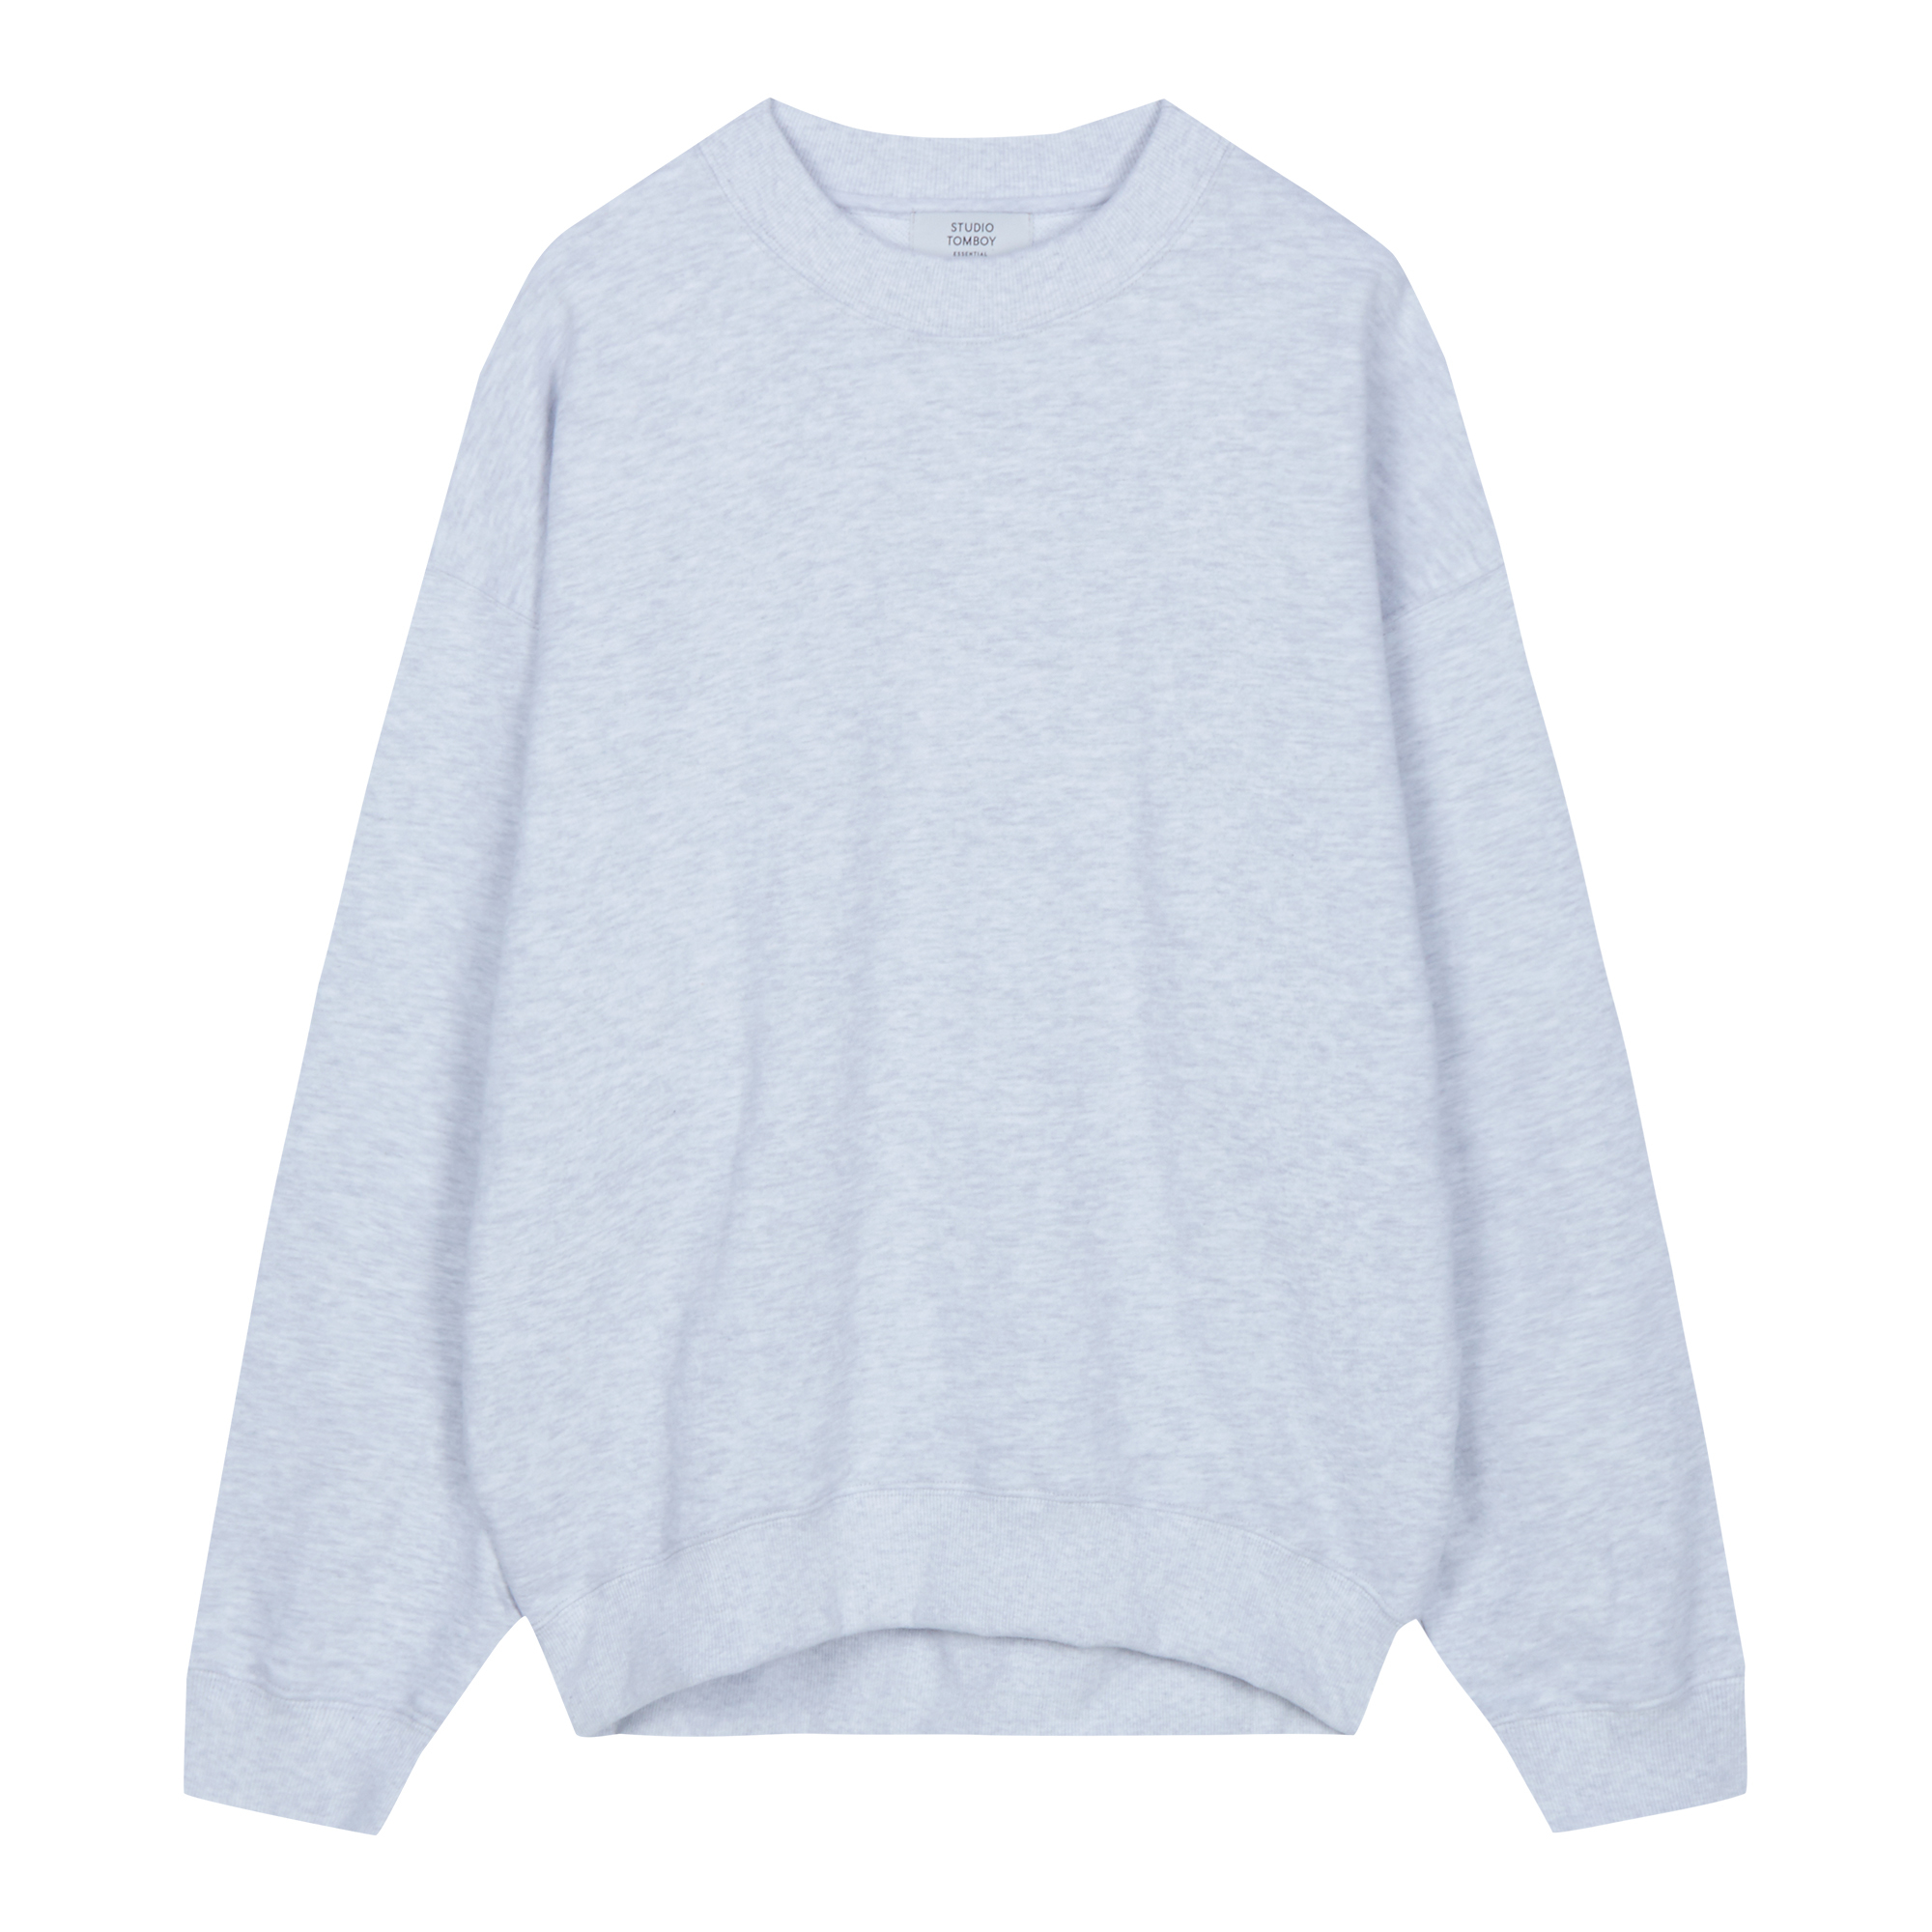 [ESSENTIAL] 베이직 맨투맨 티셔츠